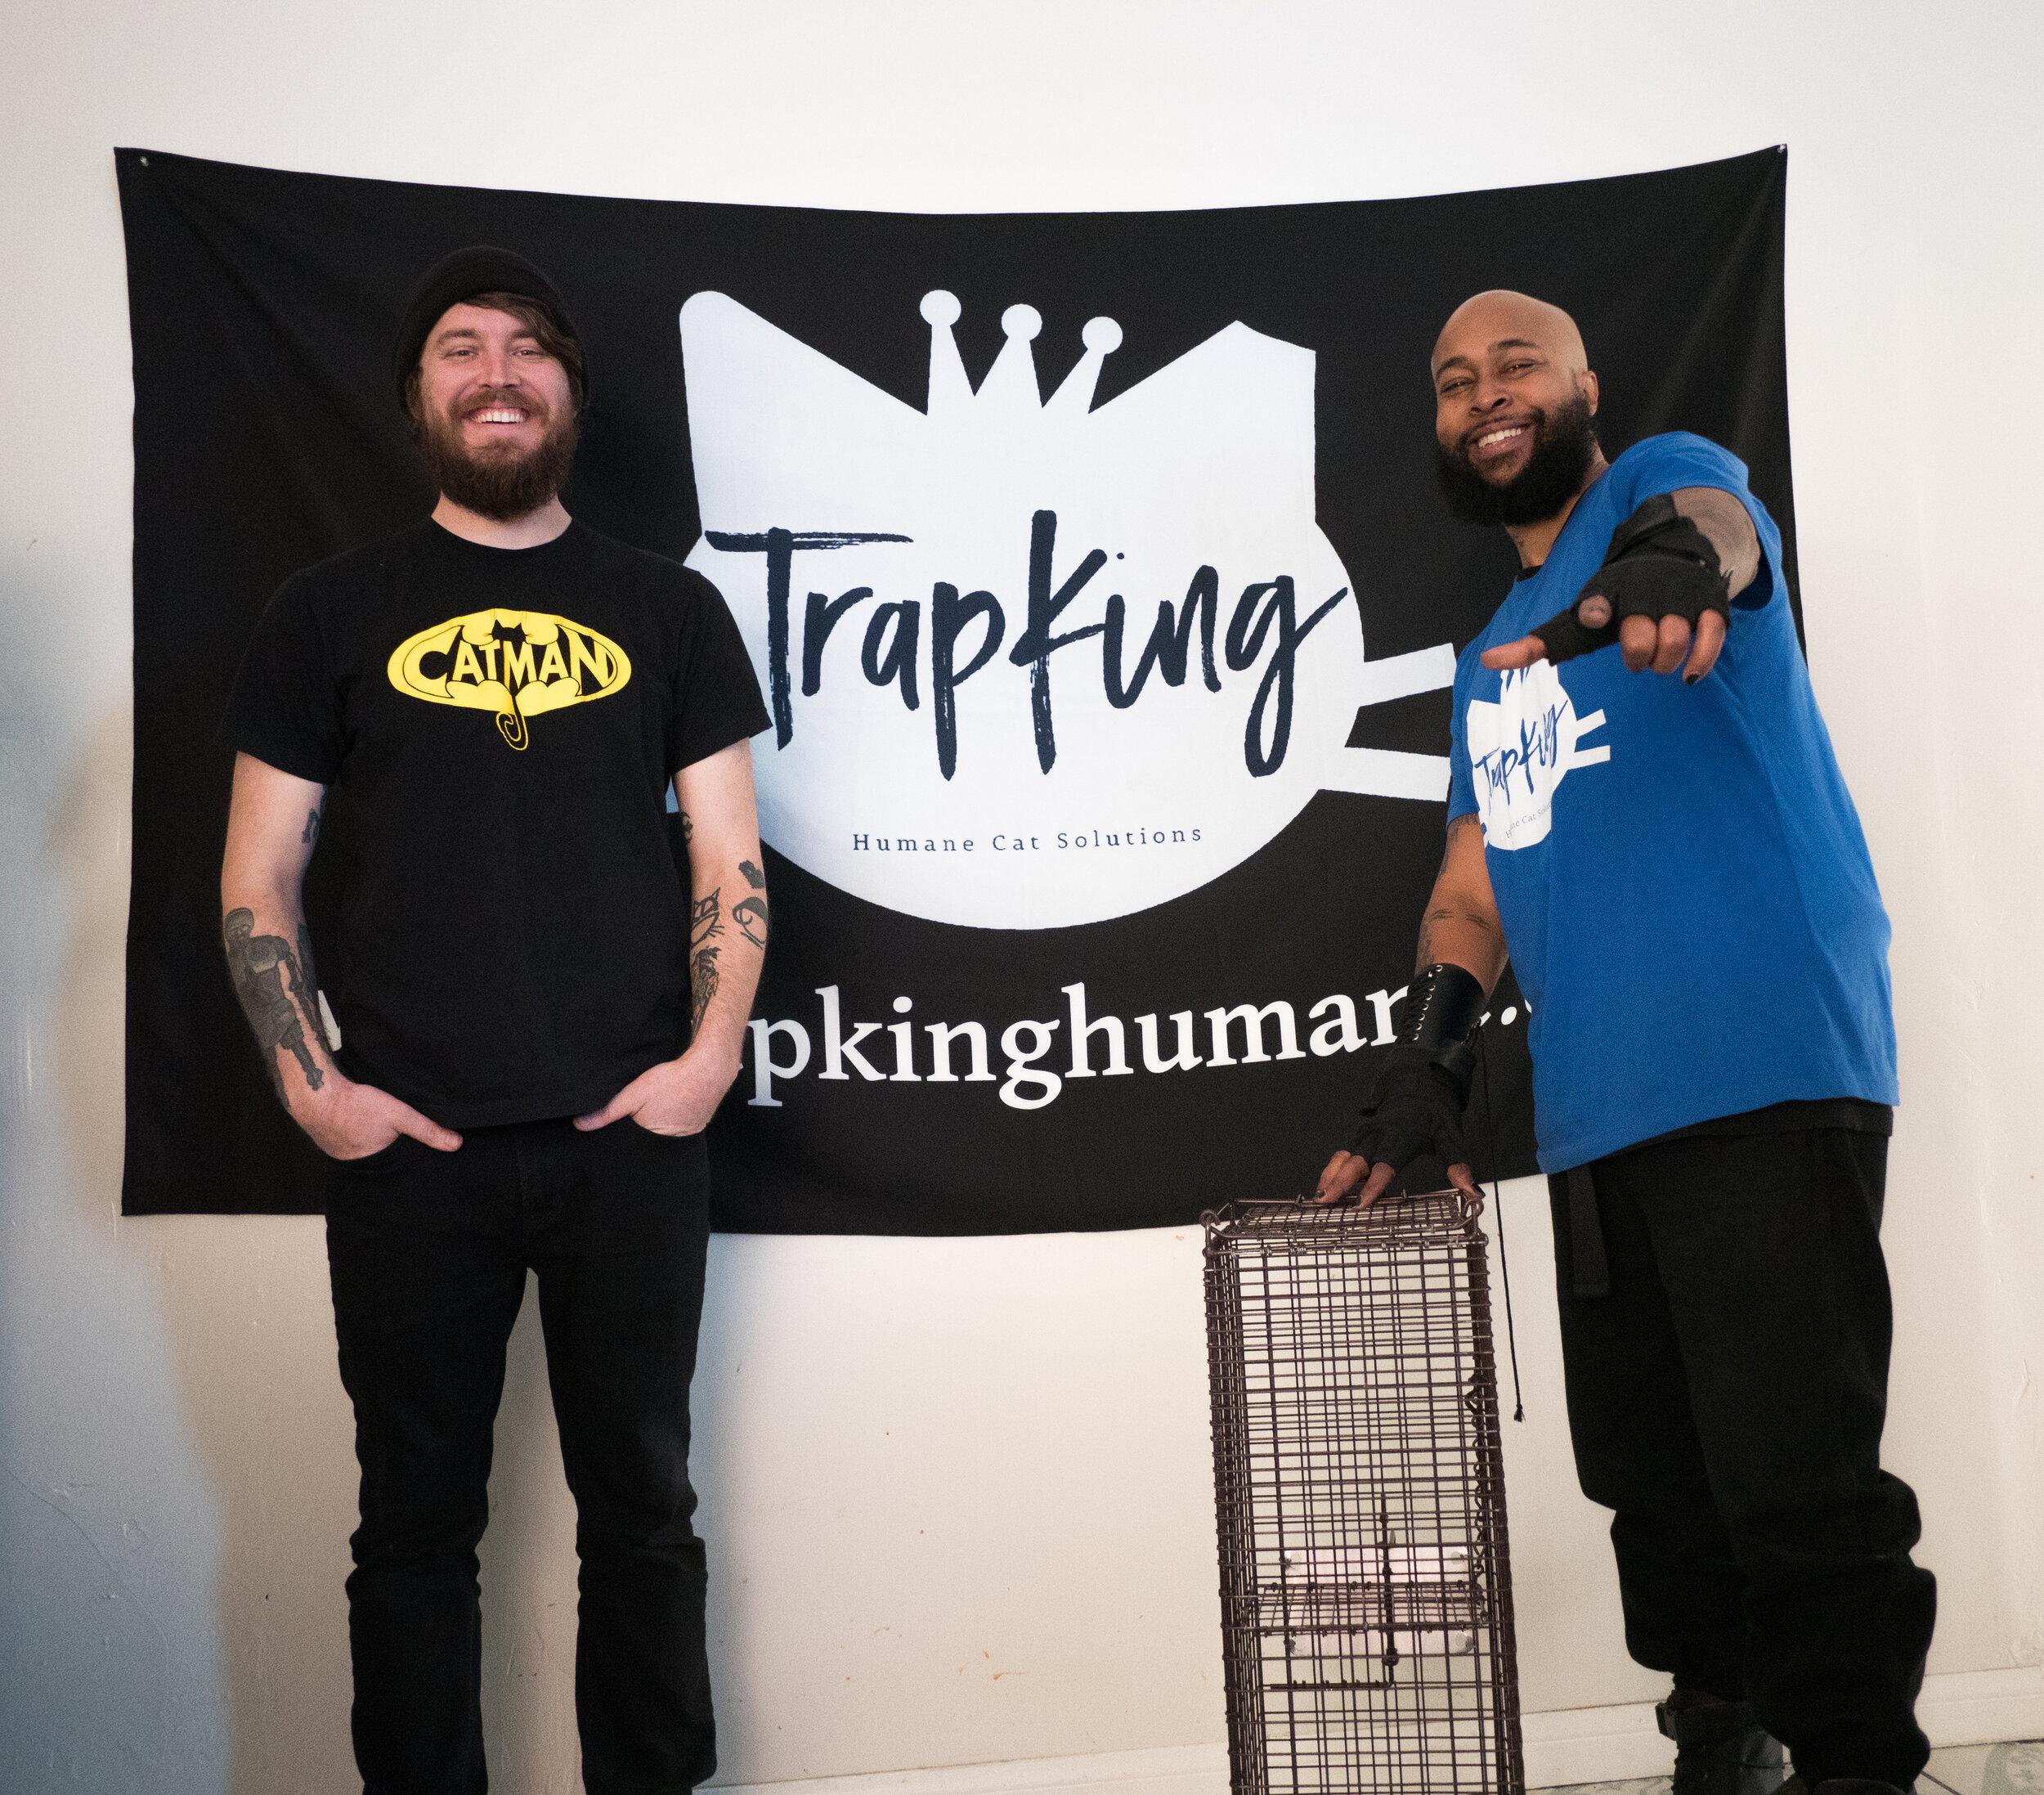 CPCC_Cat Man and Trap King-1.jpg